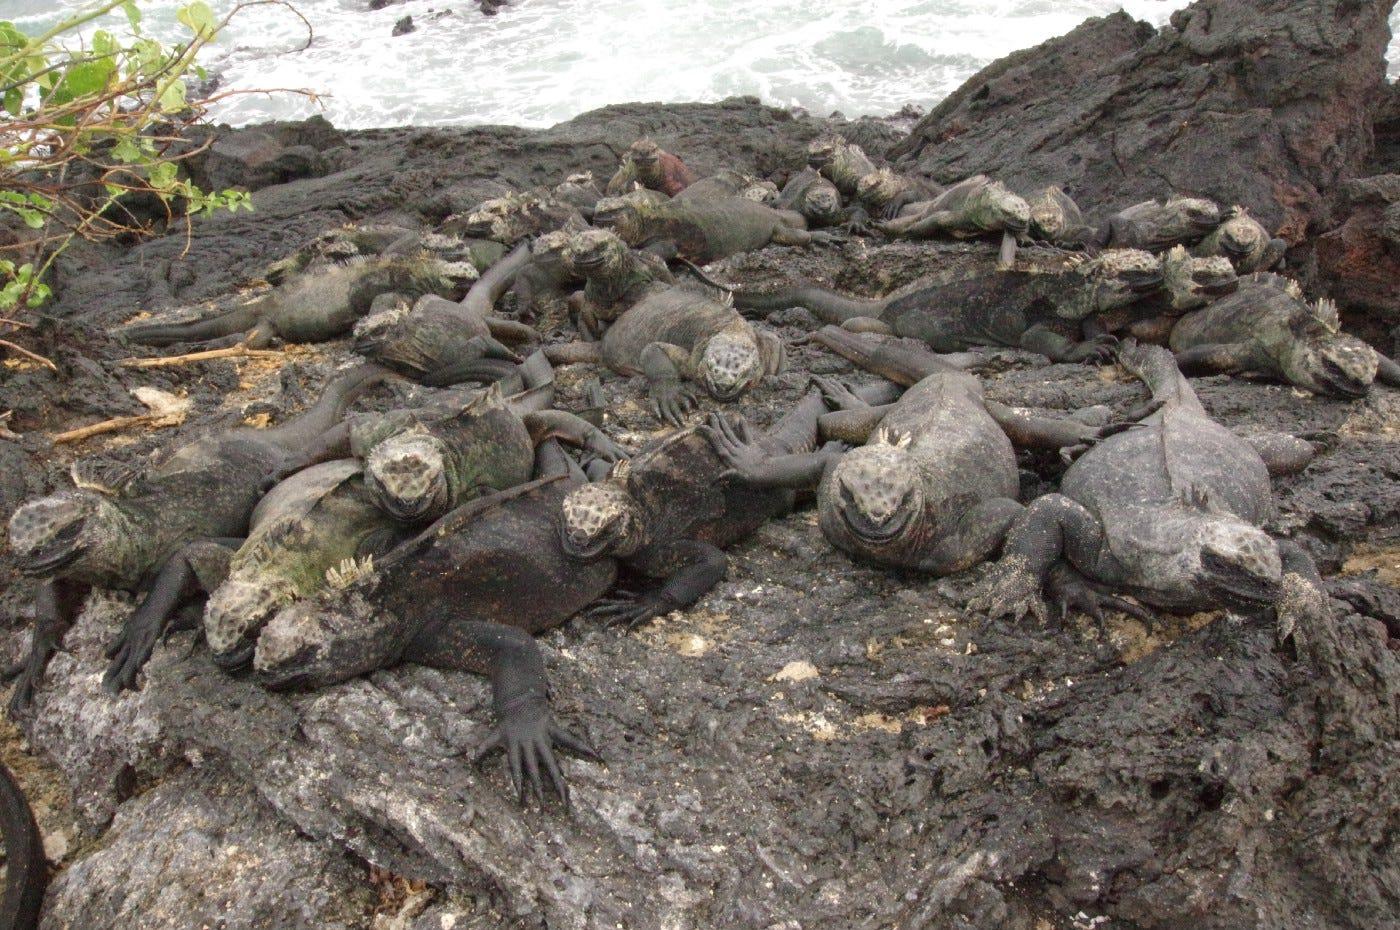 Pile o' marine iguanas. Photo by Bret, March 2016.